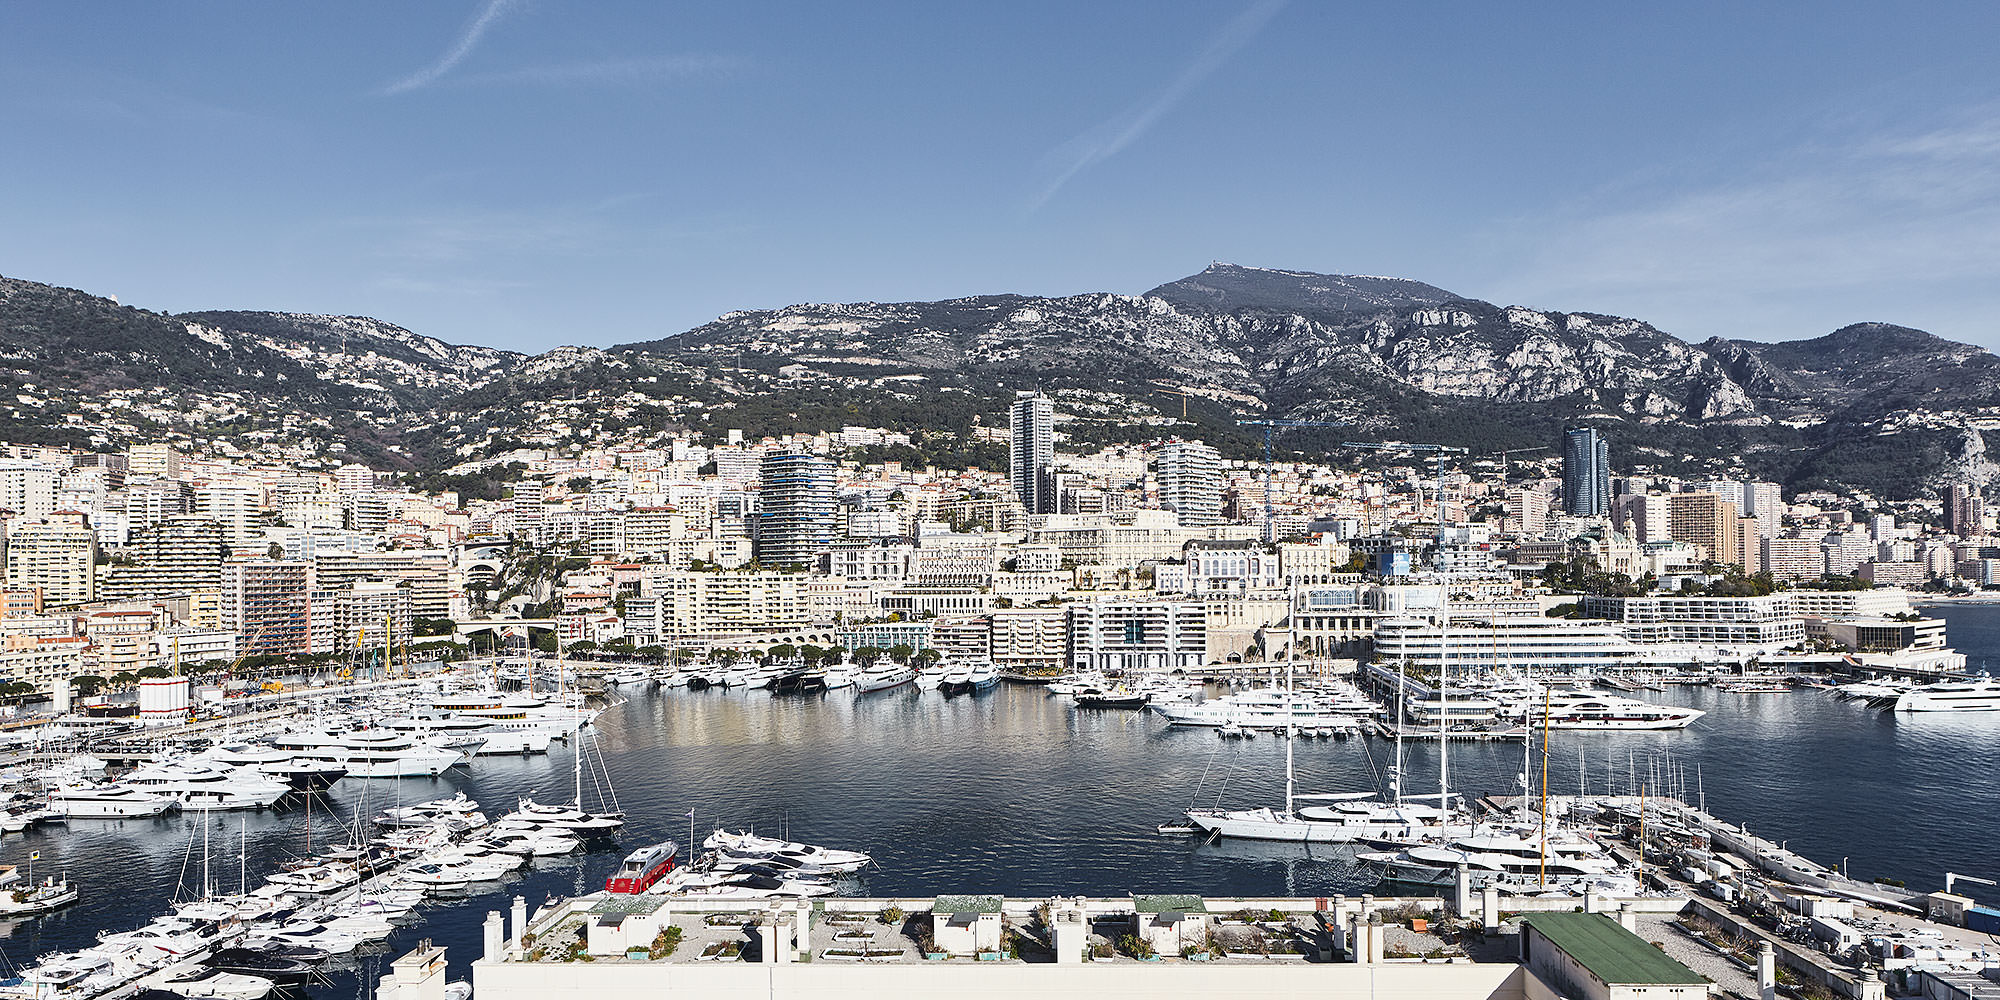 Port Hercule, Monaco © Philip Kistner